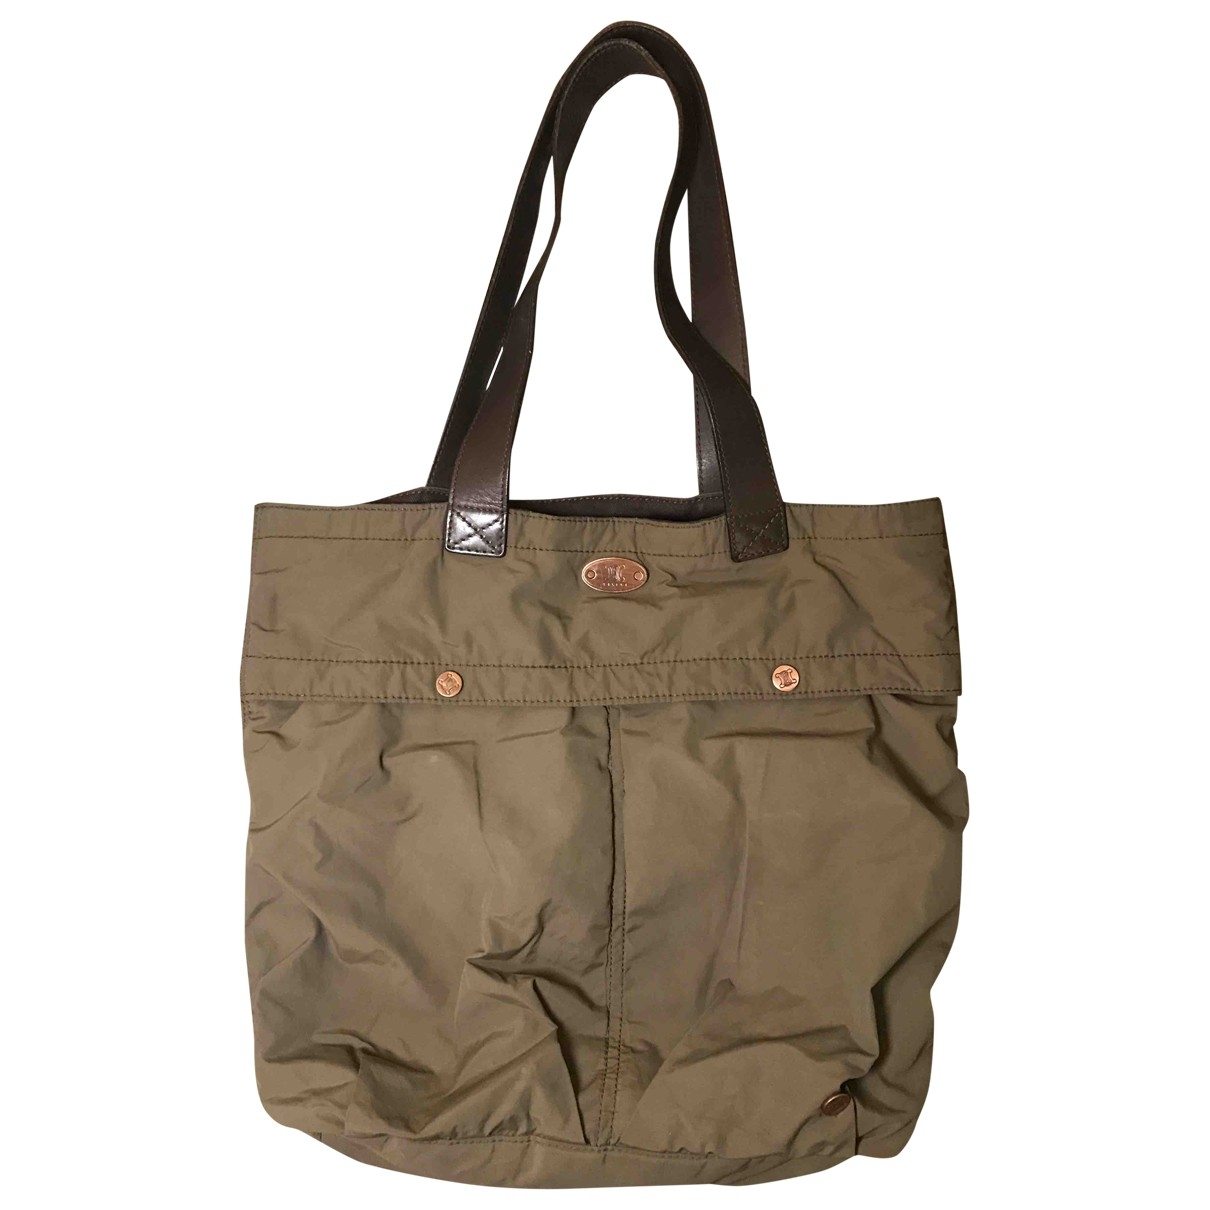 Celine \N Khaki Cloth handbag for Women \N